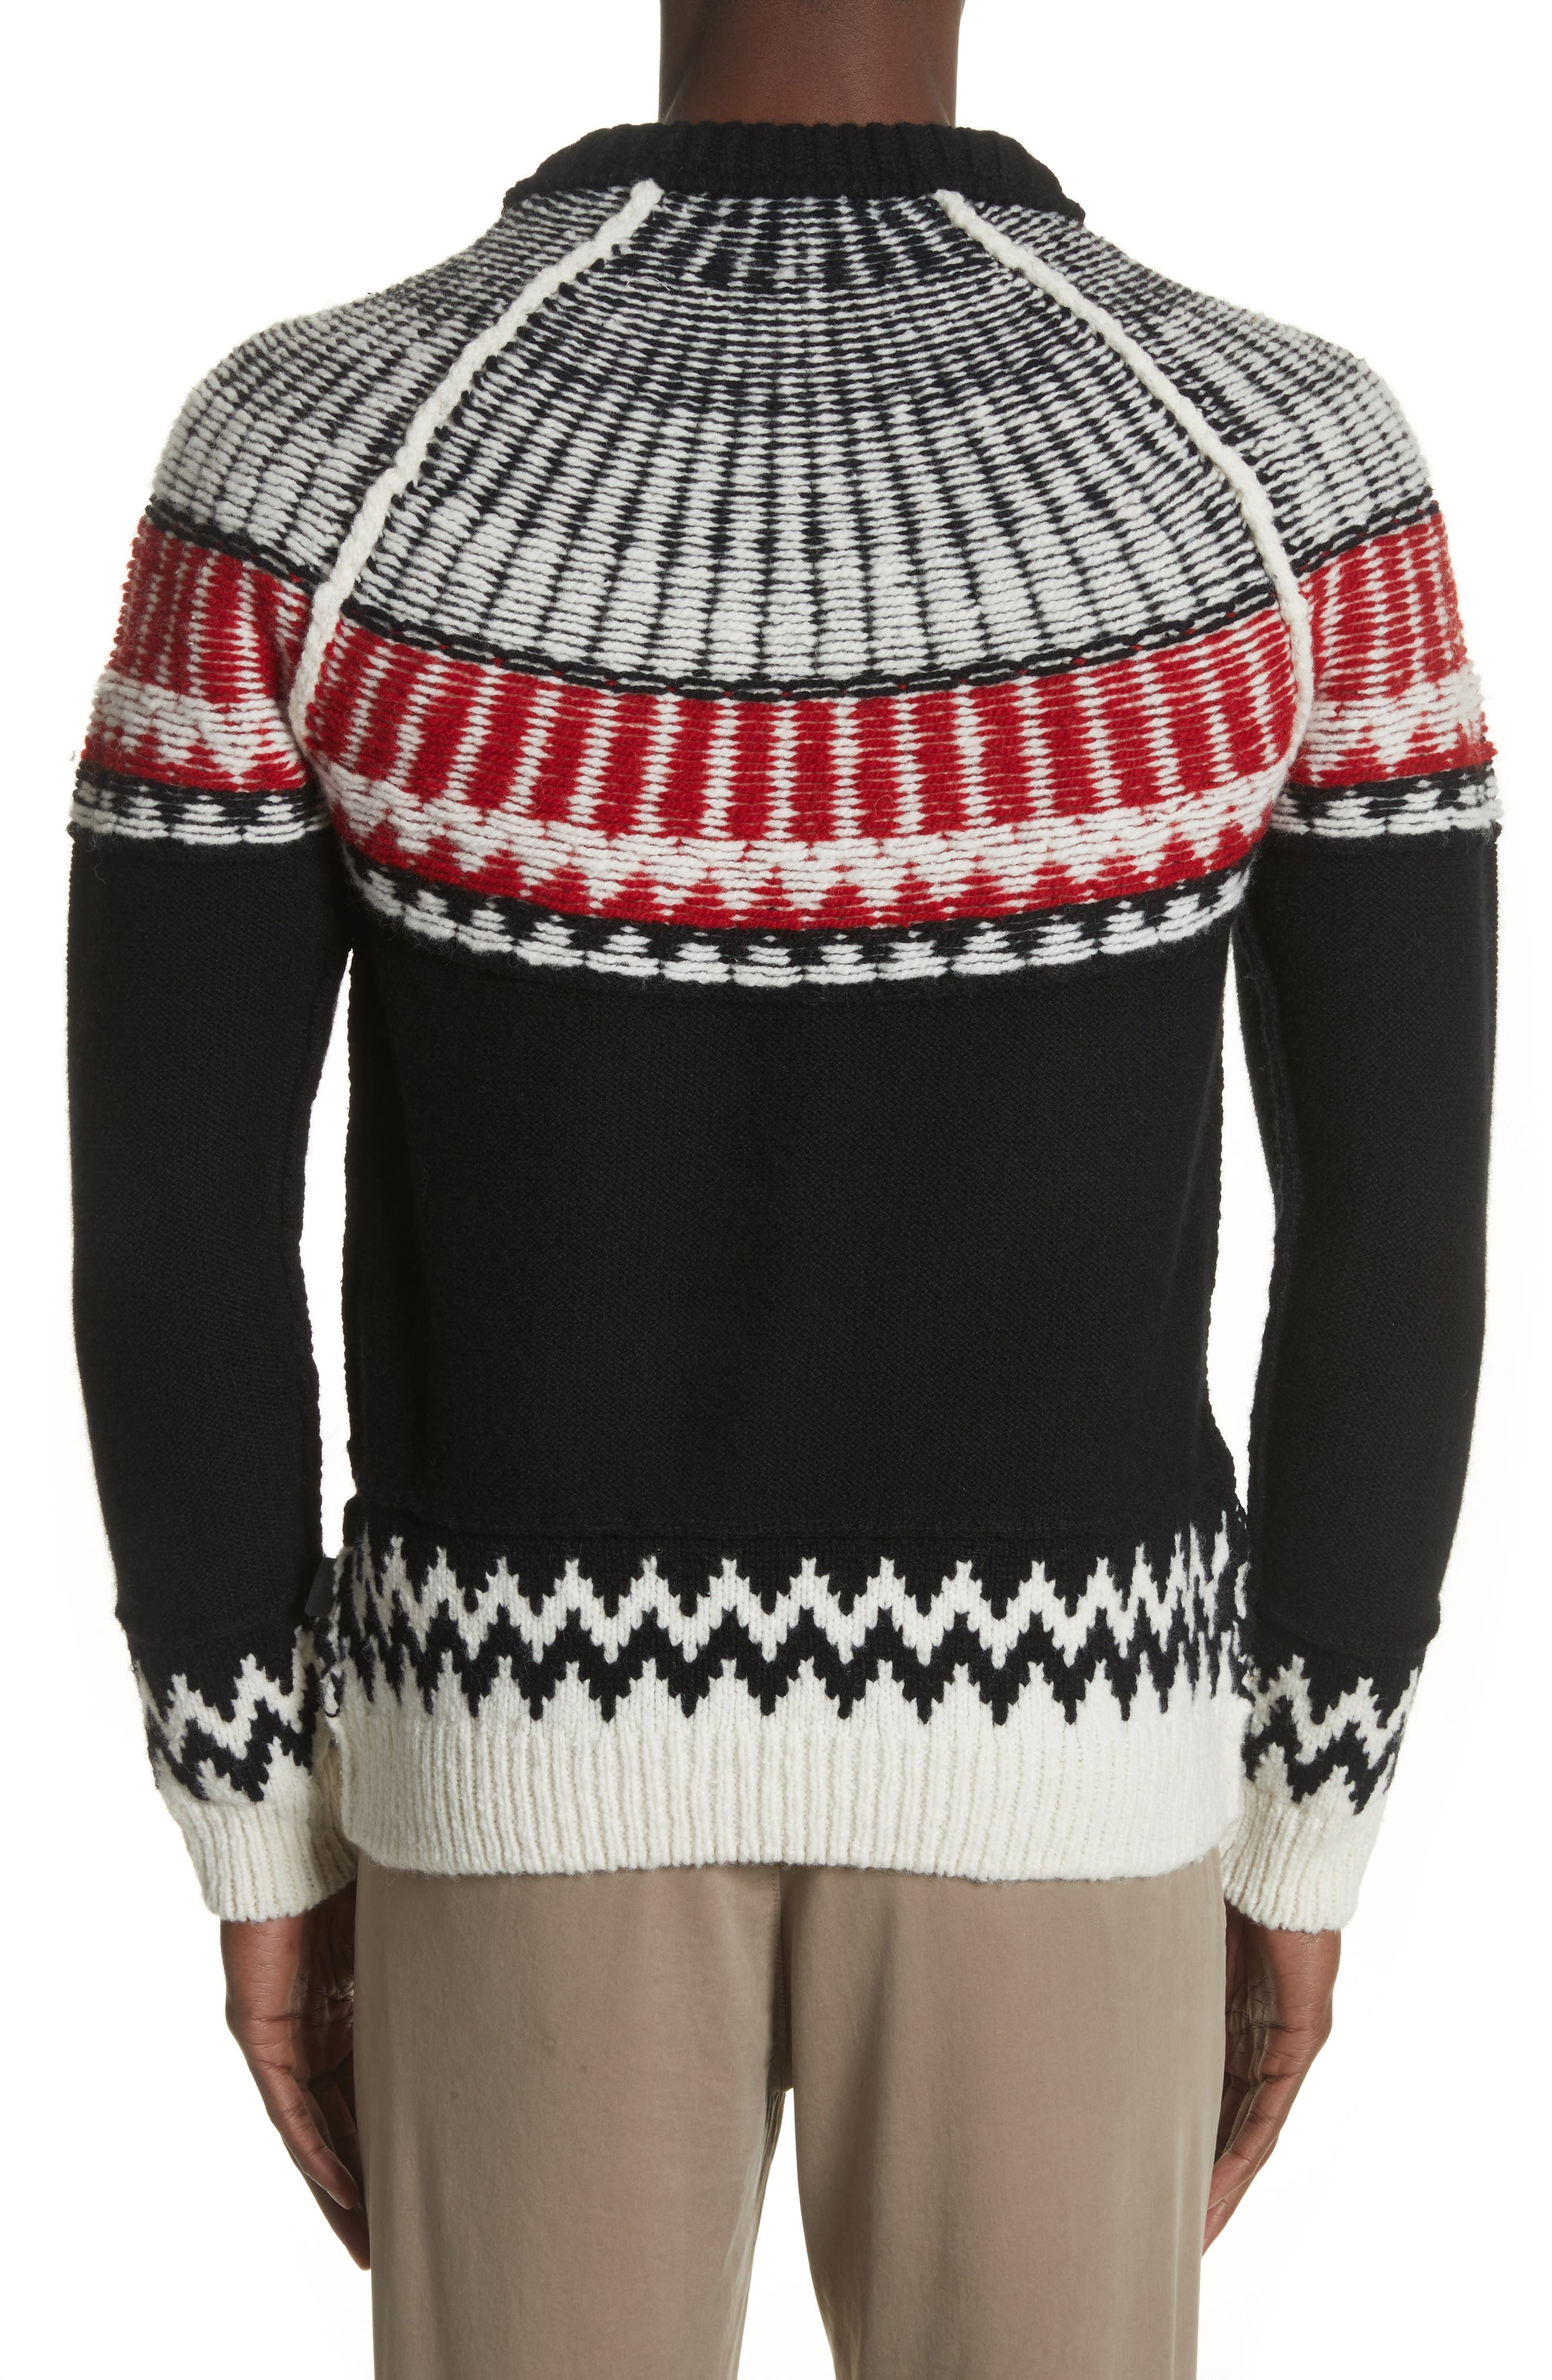 Rycroft Wool & Cashmere Blend Sweater,                             Alternate thumbnail 2, color,                             001